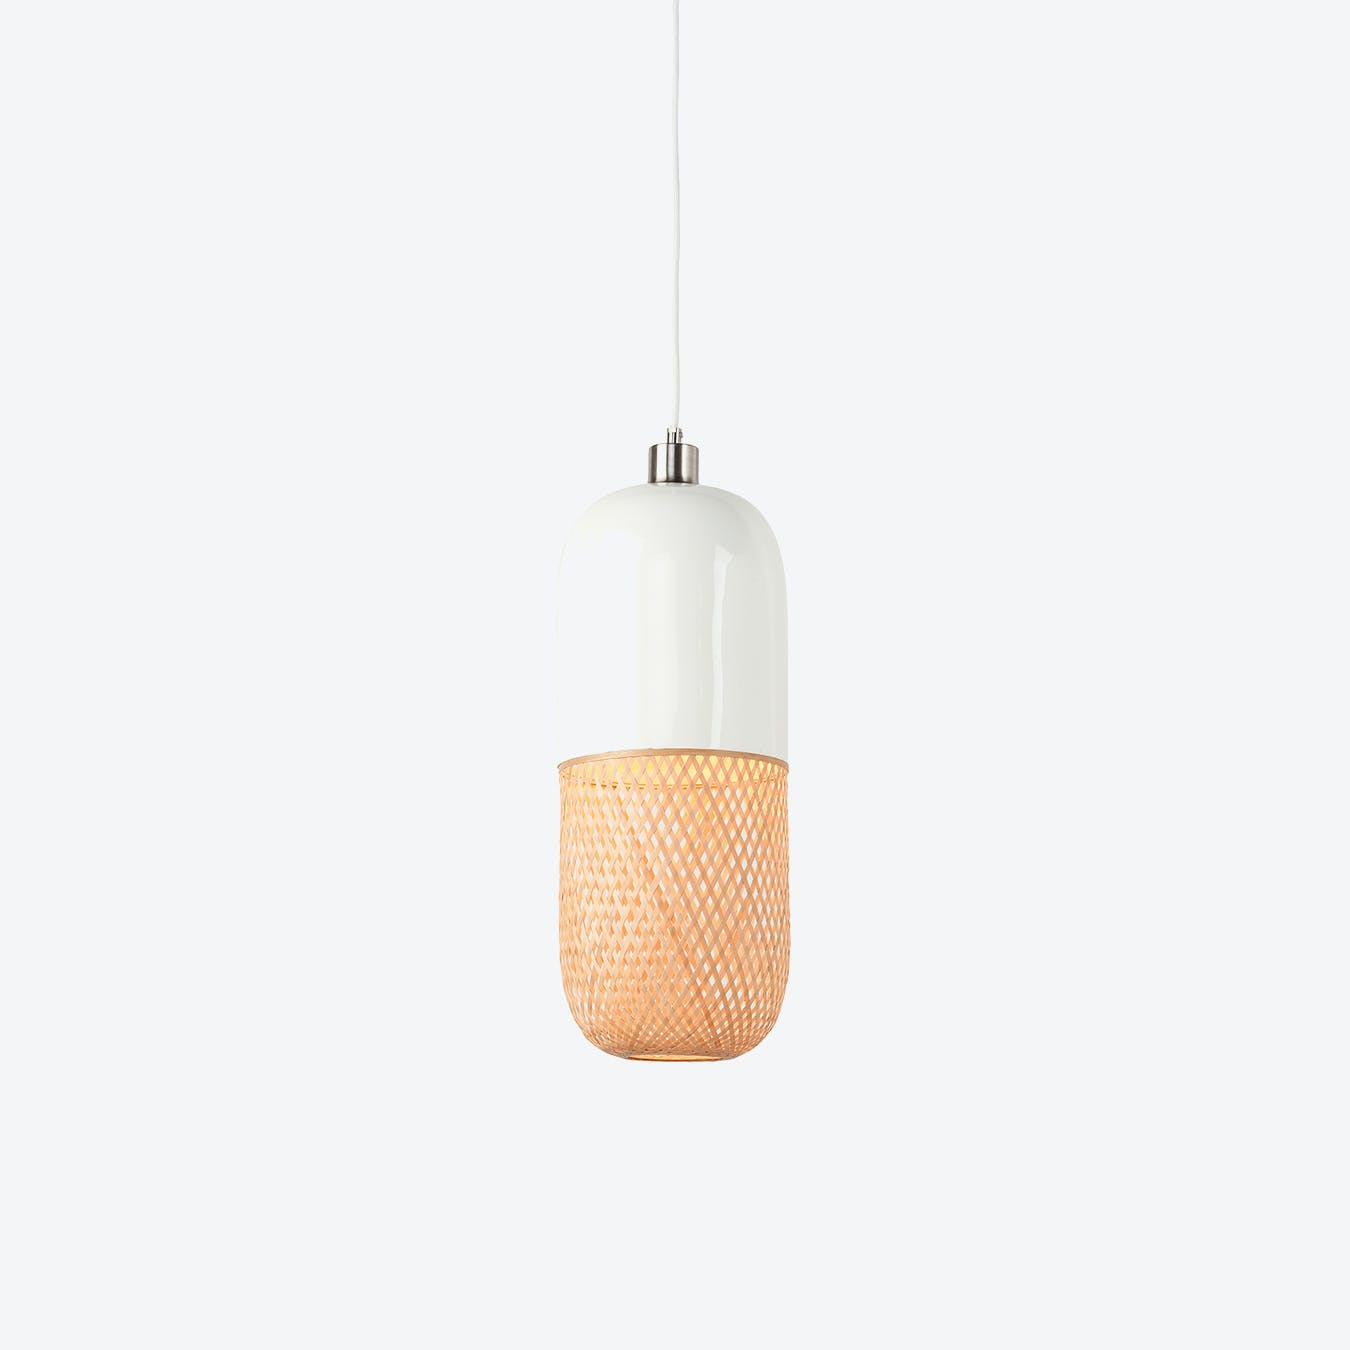 Mekong Pendant Lamp - Ø 20 cm